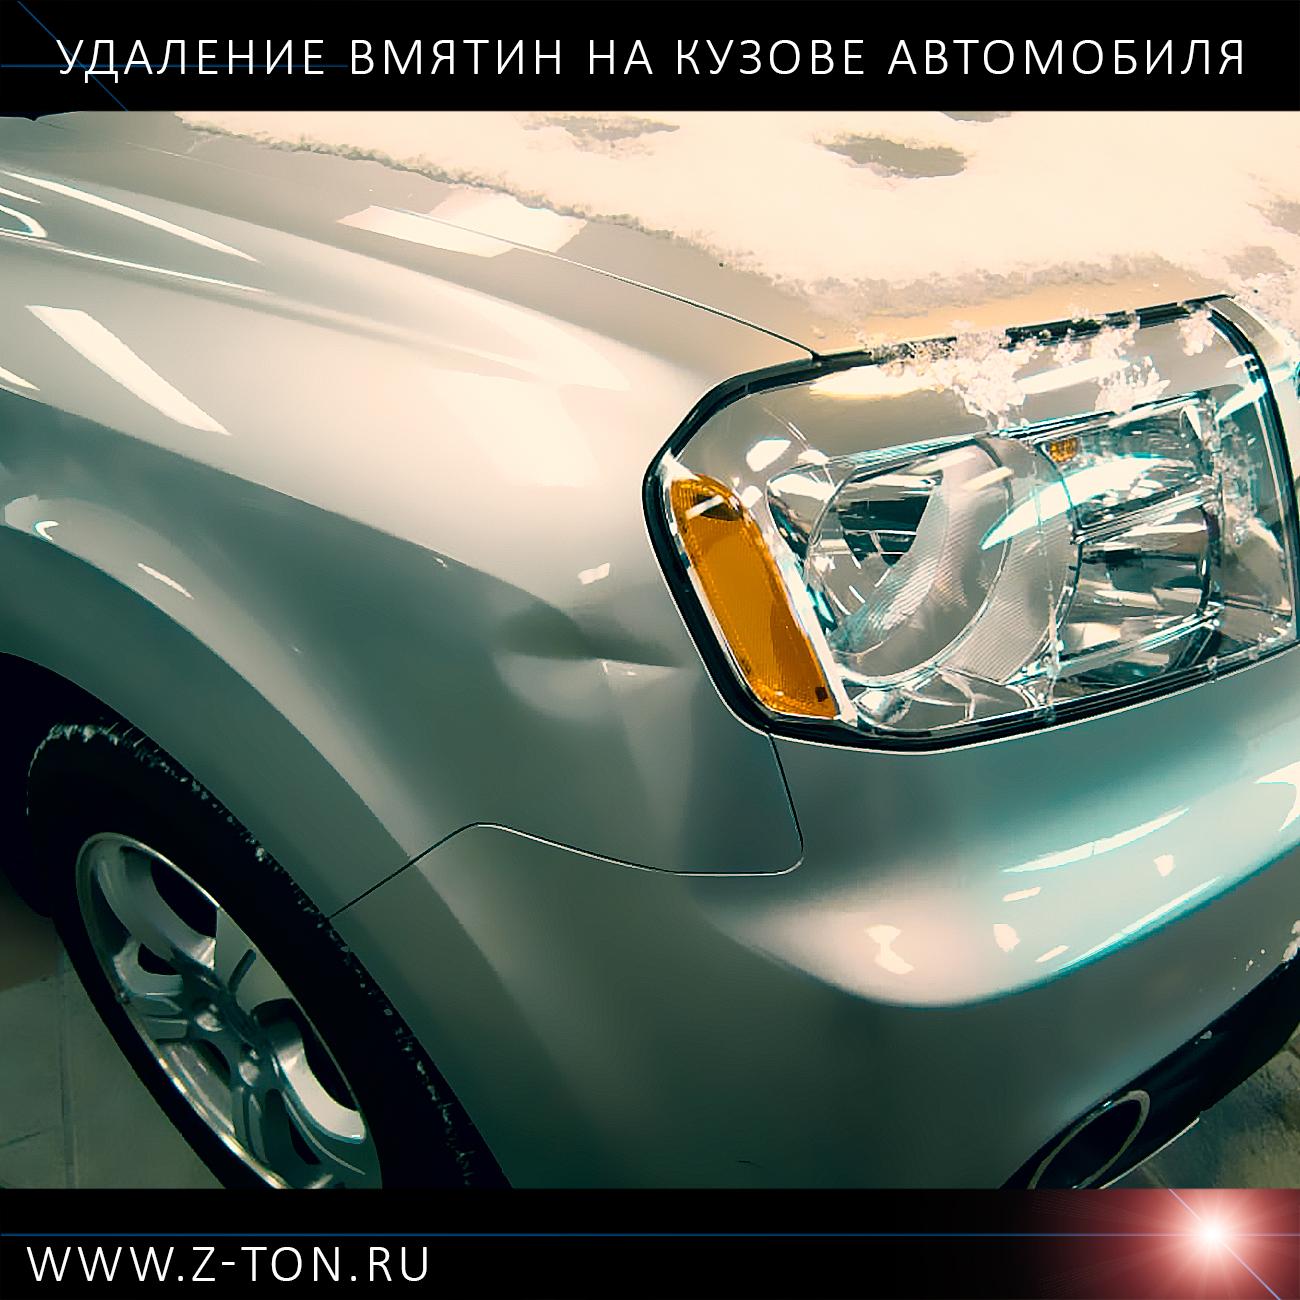 Удаление вмятин на кузове автомобиля в Зеленограде